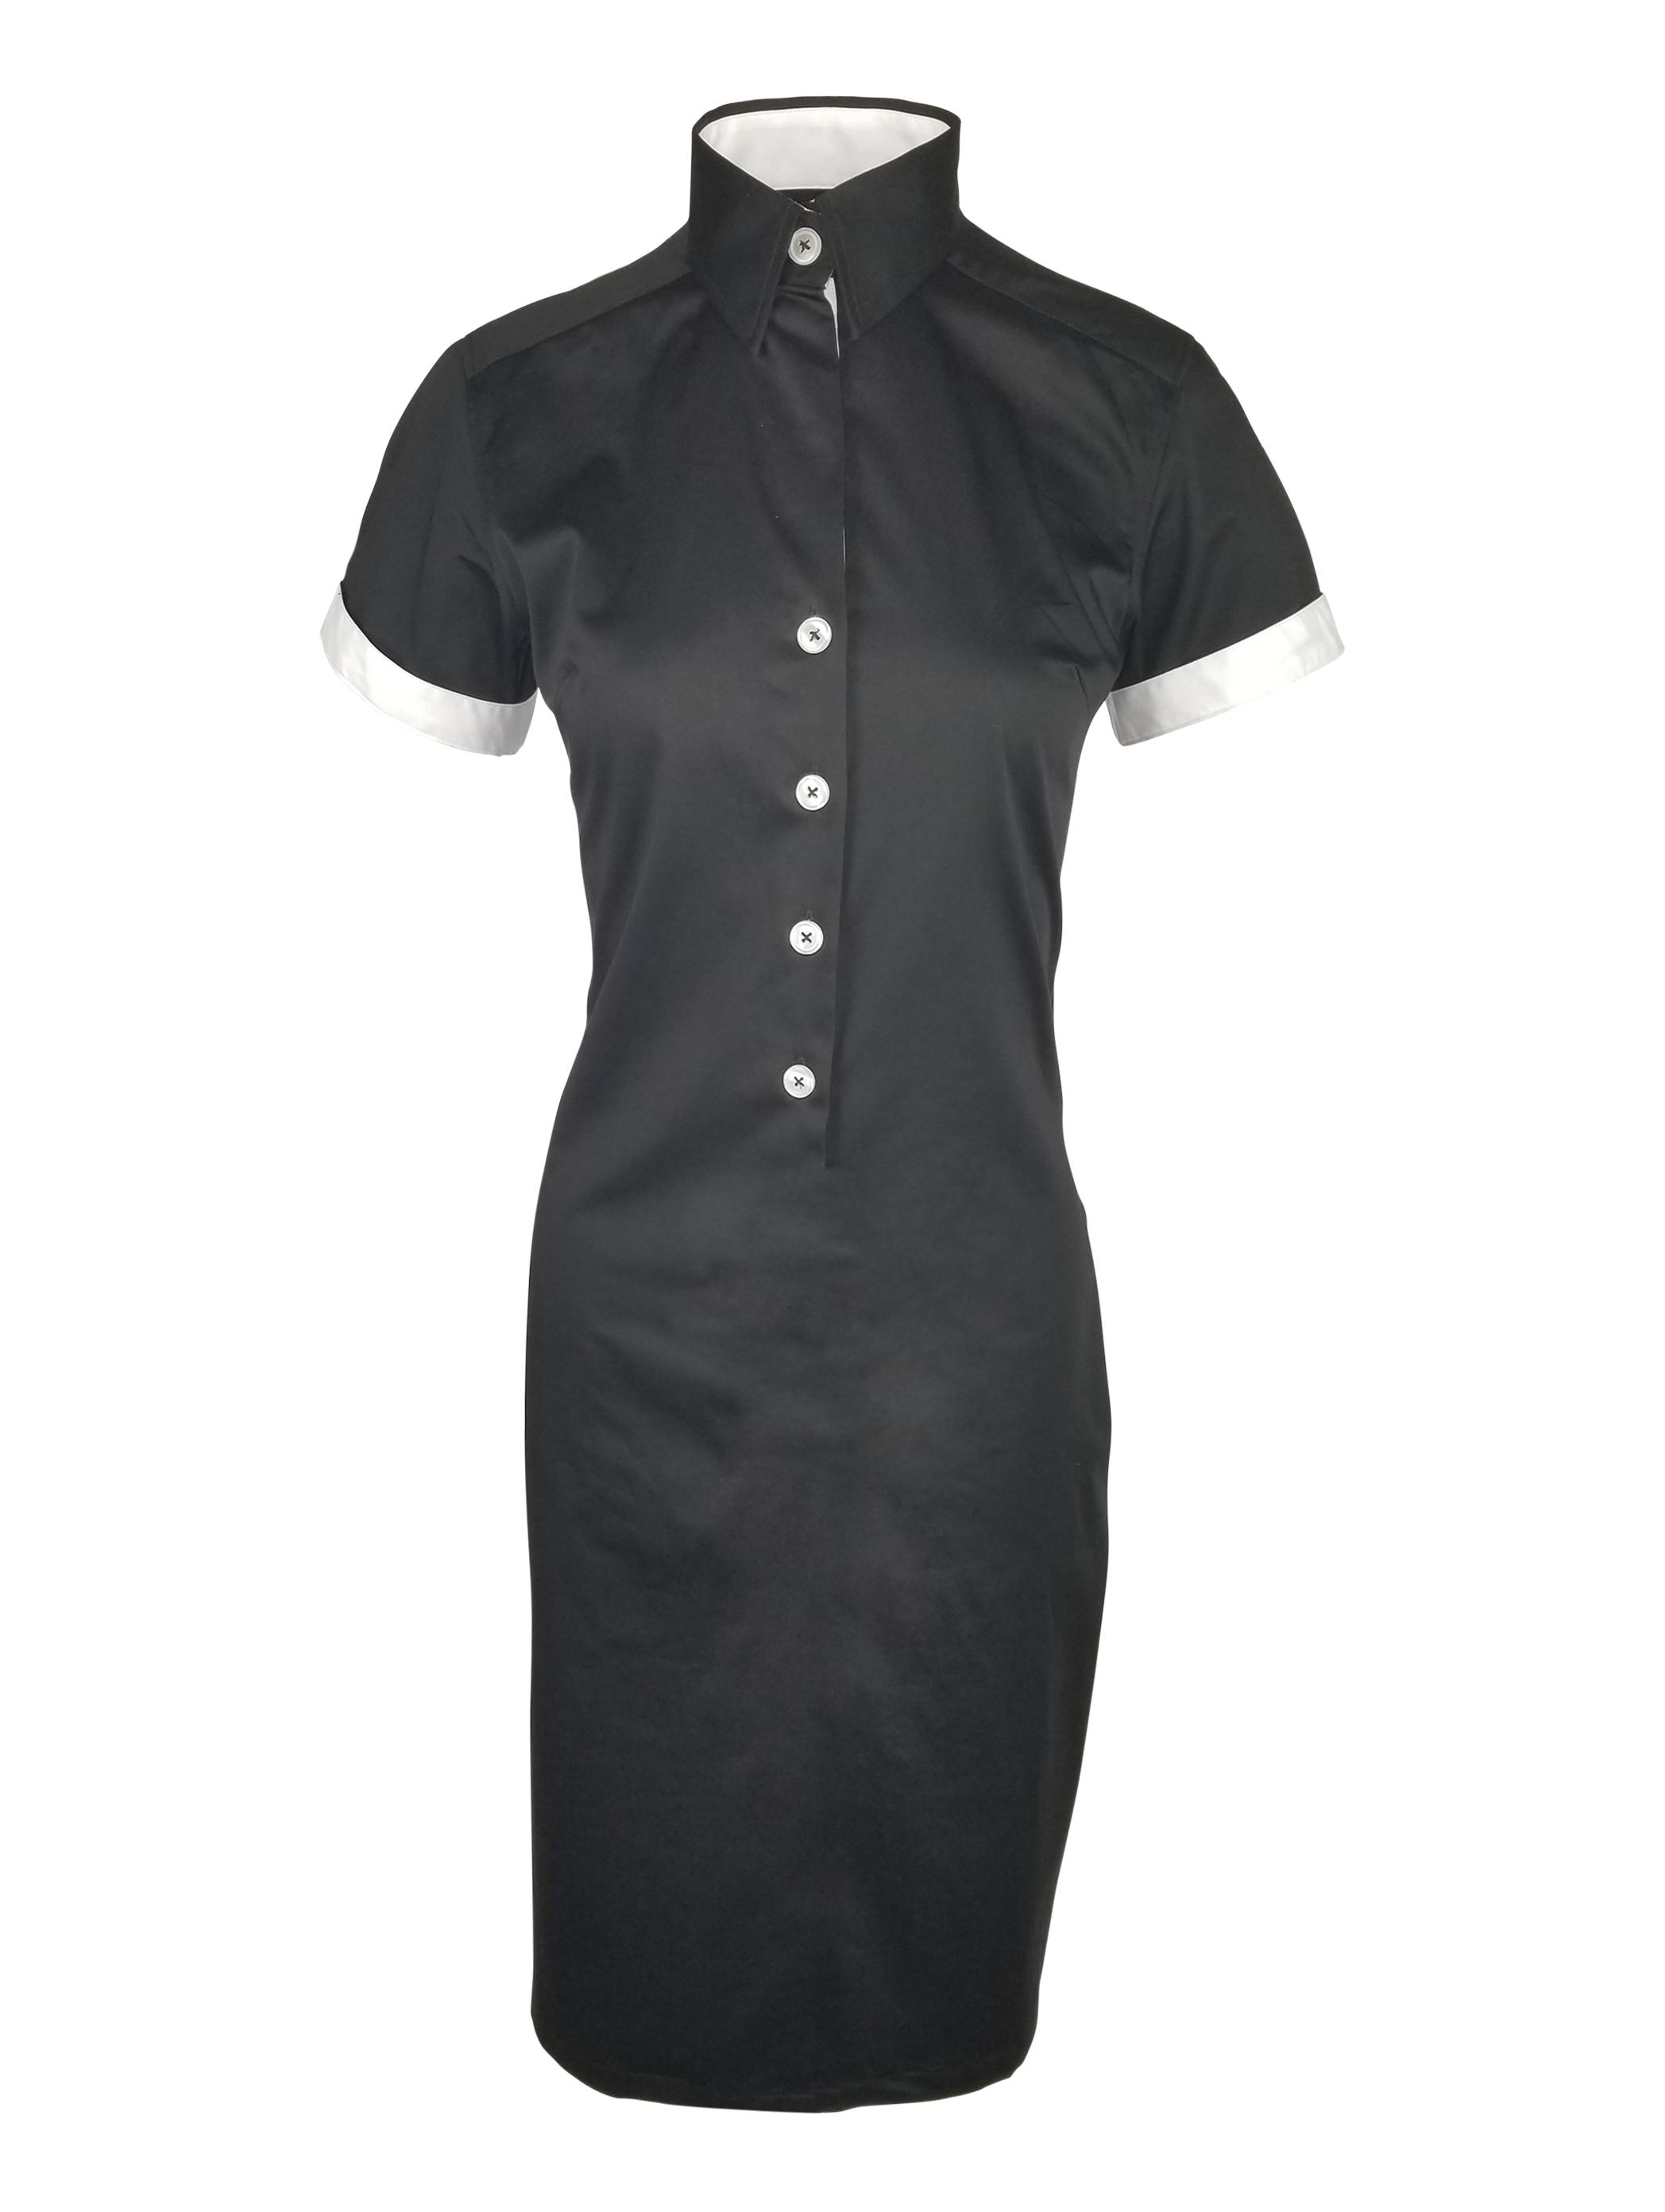 8e0c0ba5 Black And White Short Sleeve Sheath Dress